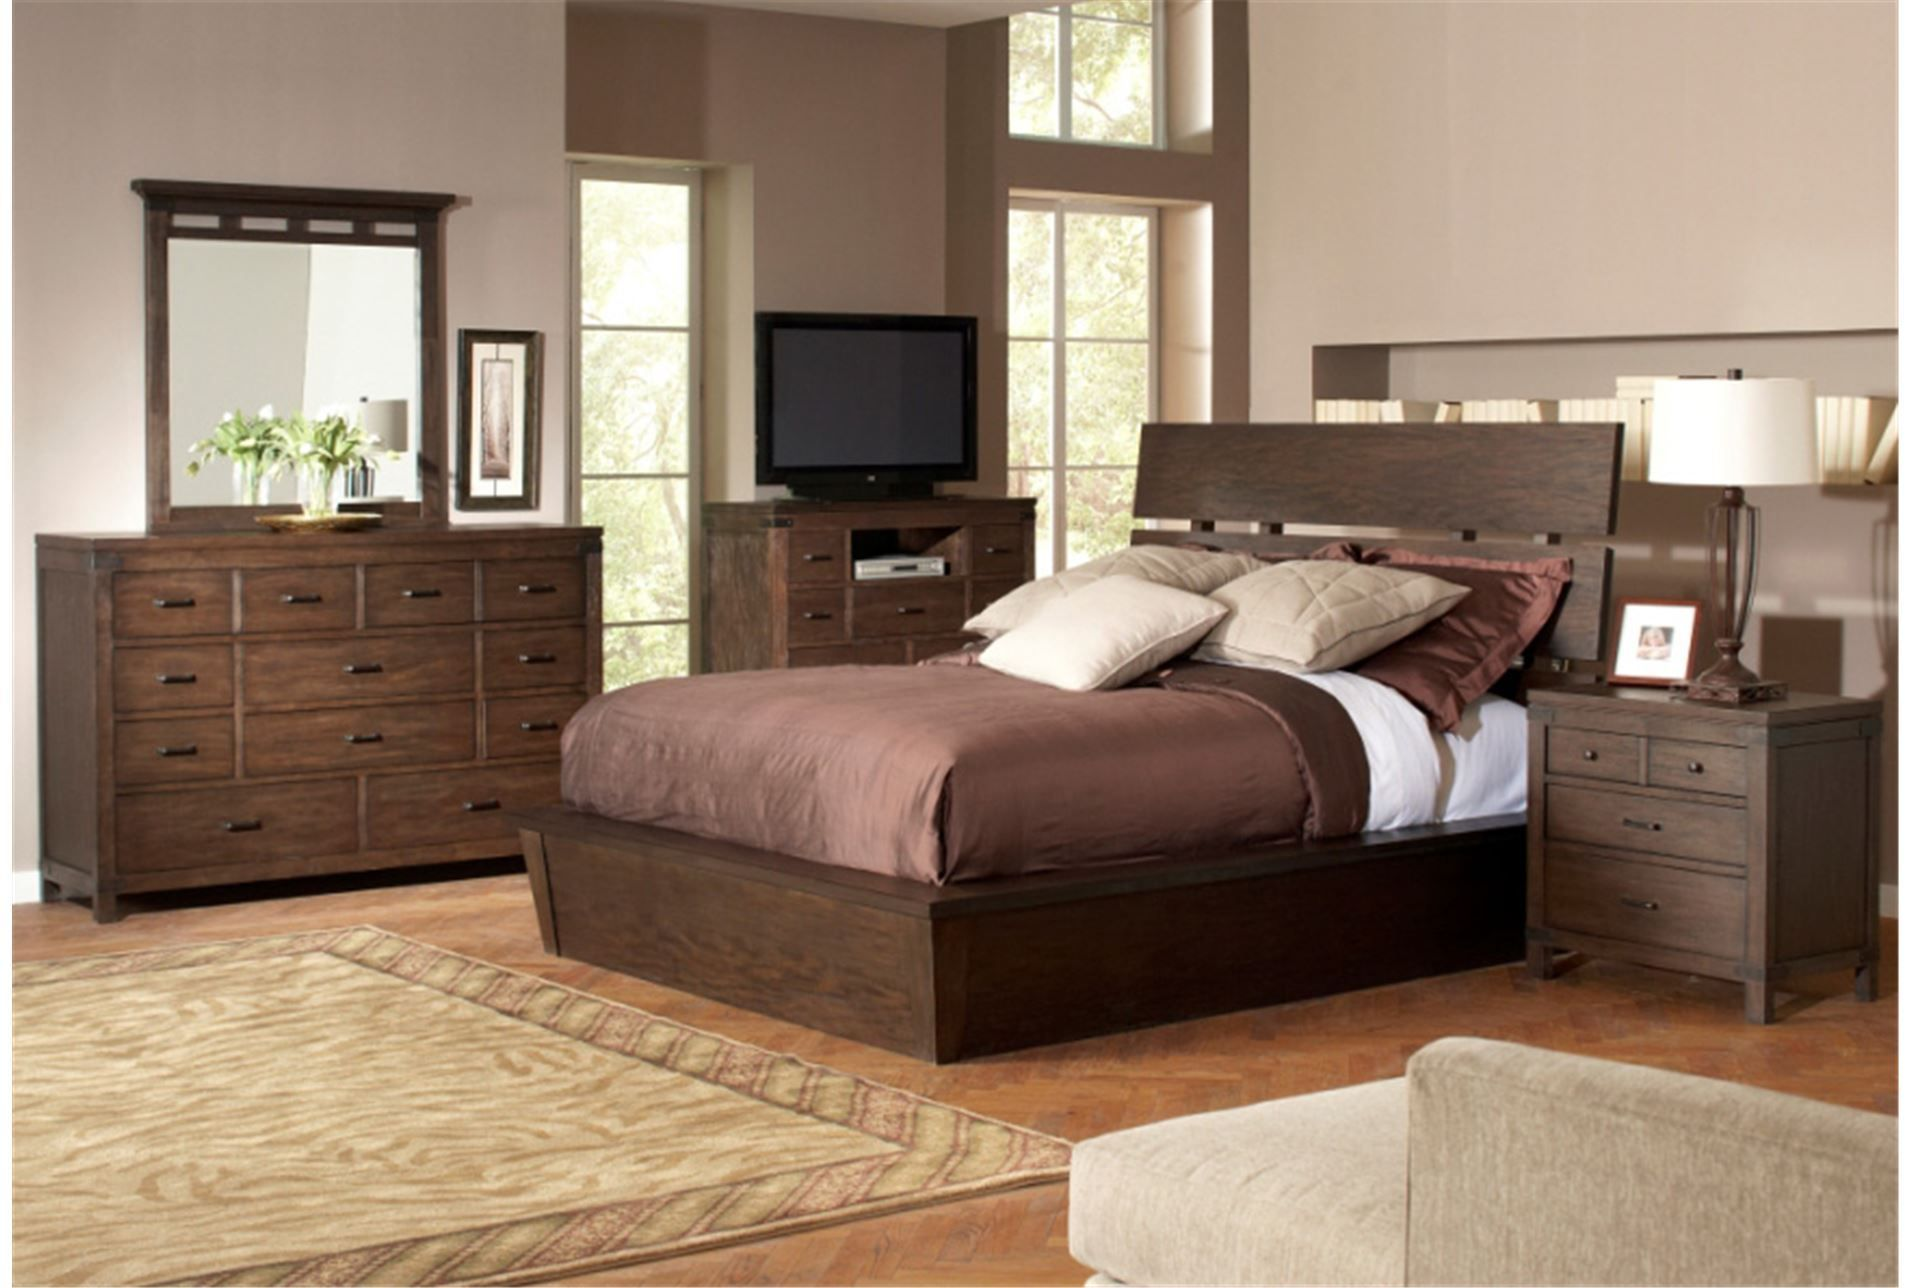 Livingston Bedroom furniture minus bed. Living Spaces.  Riverside